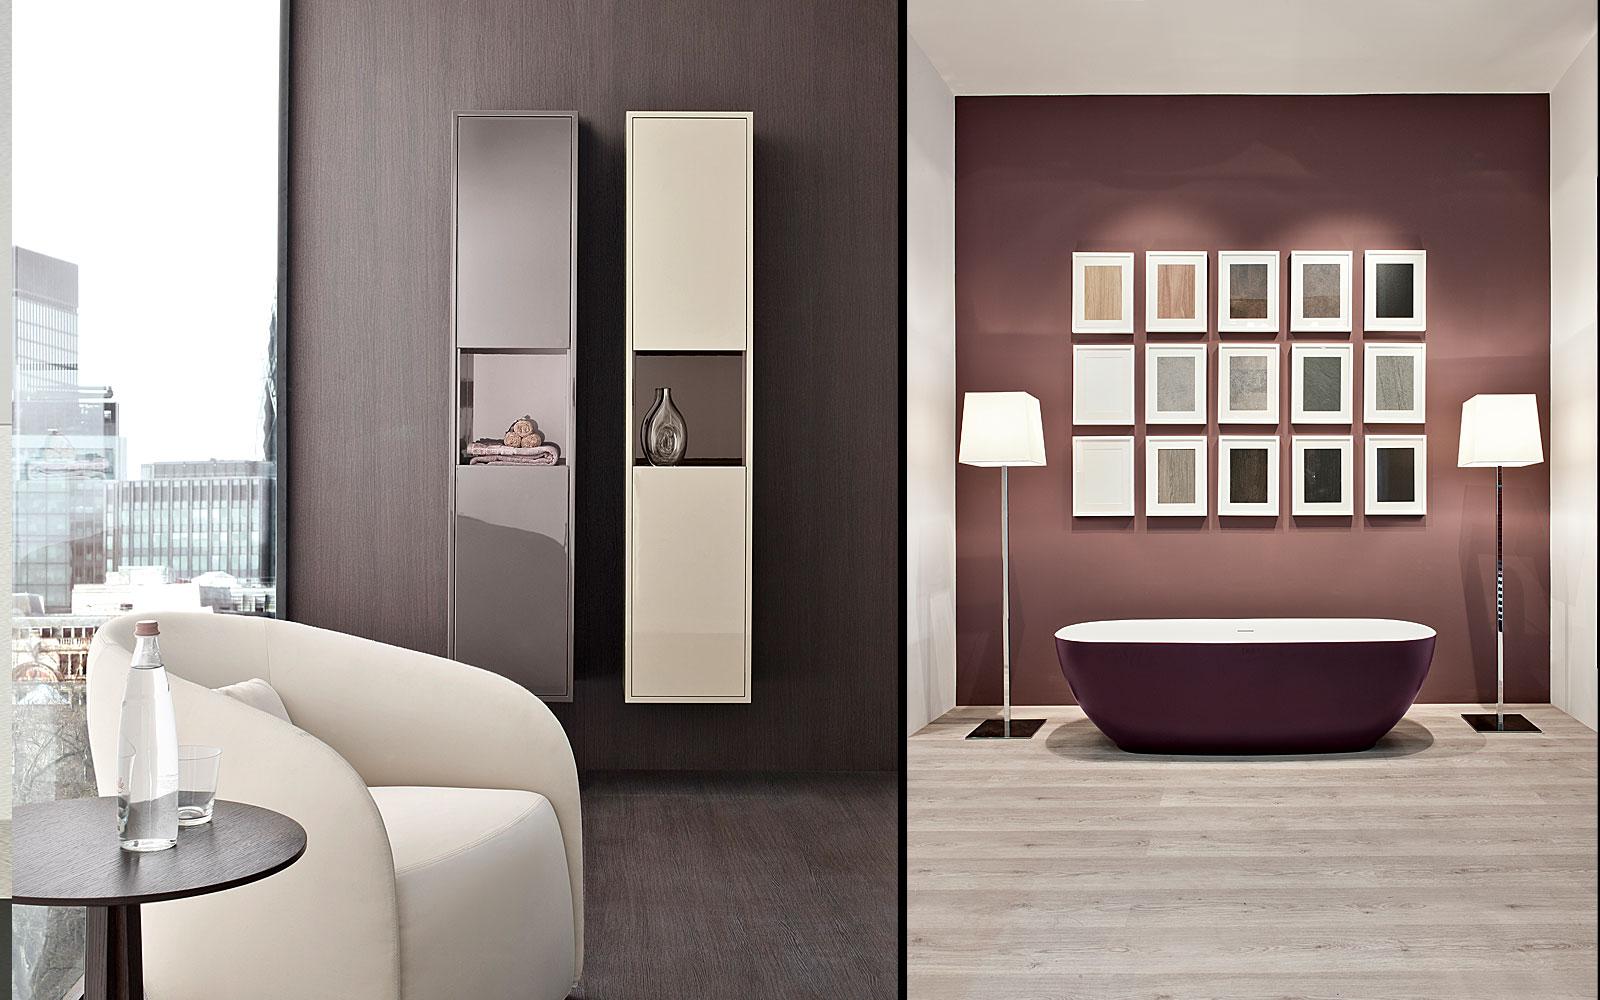 wohnraumgestaltung, badmanufaktur roth - wohnraumgestaltung, Design ideen